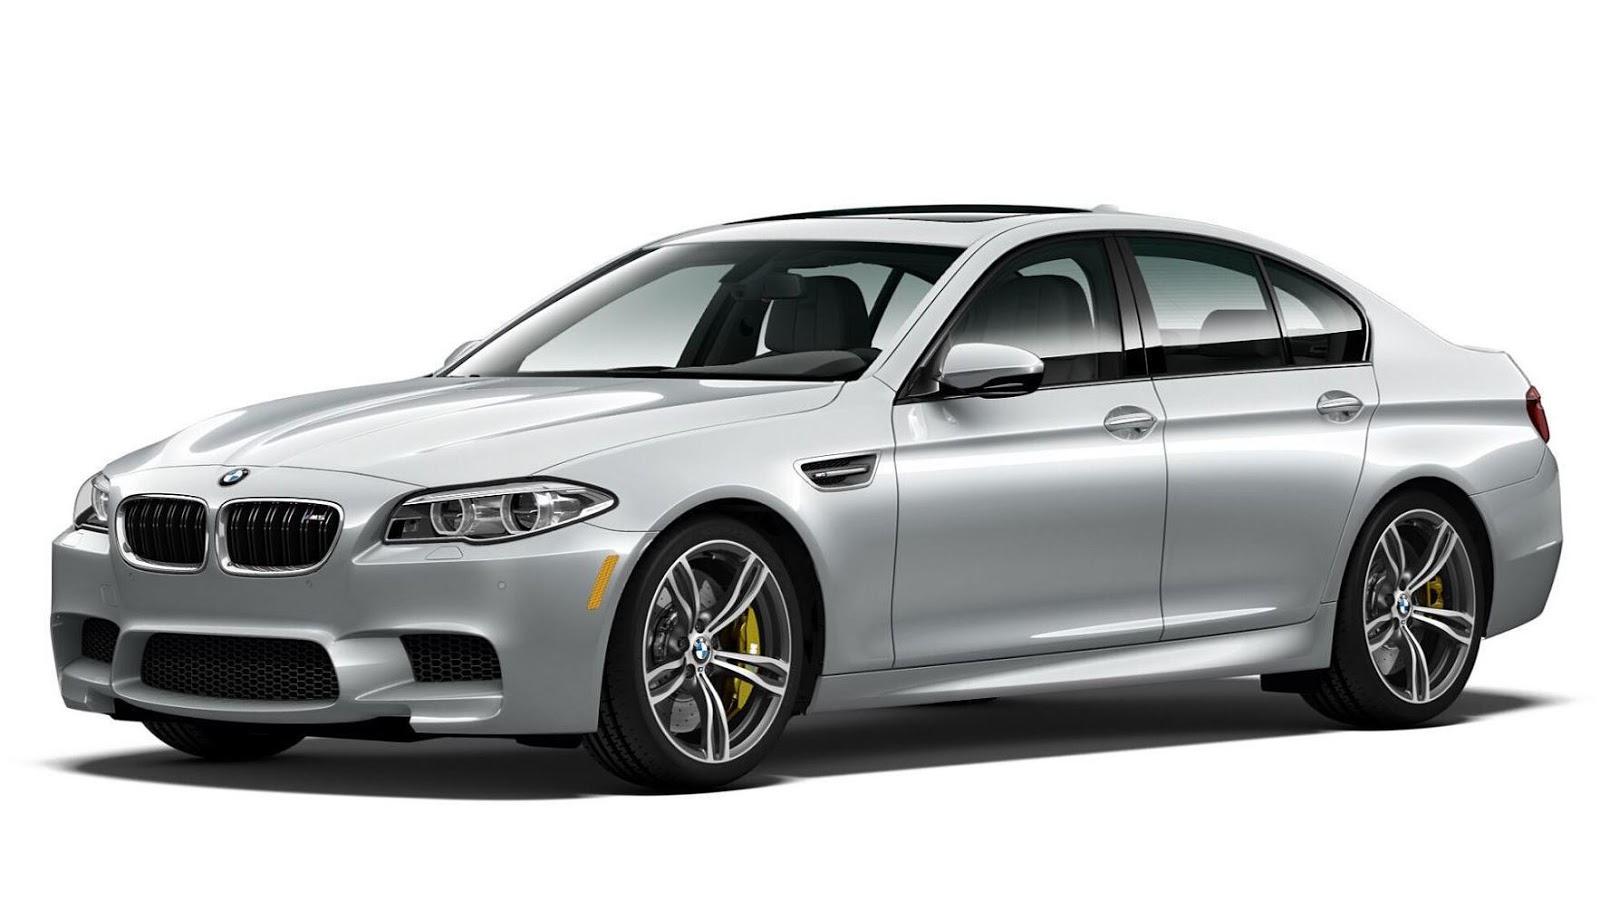 Ra mắt BMW M5 Pure Metal Silver bản giới hạn - 2